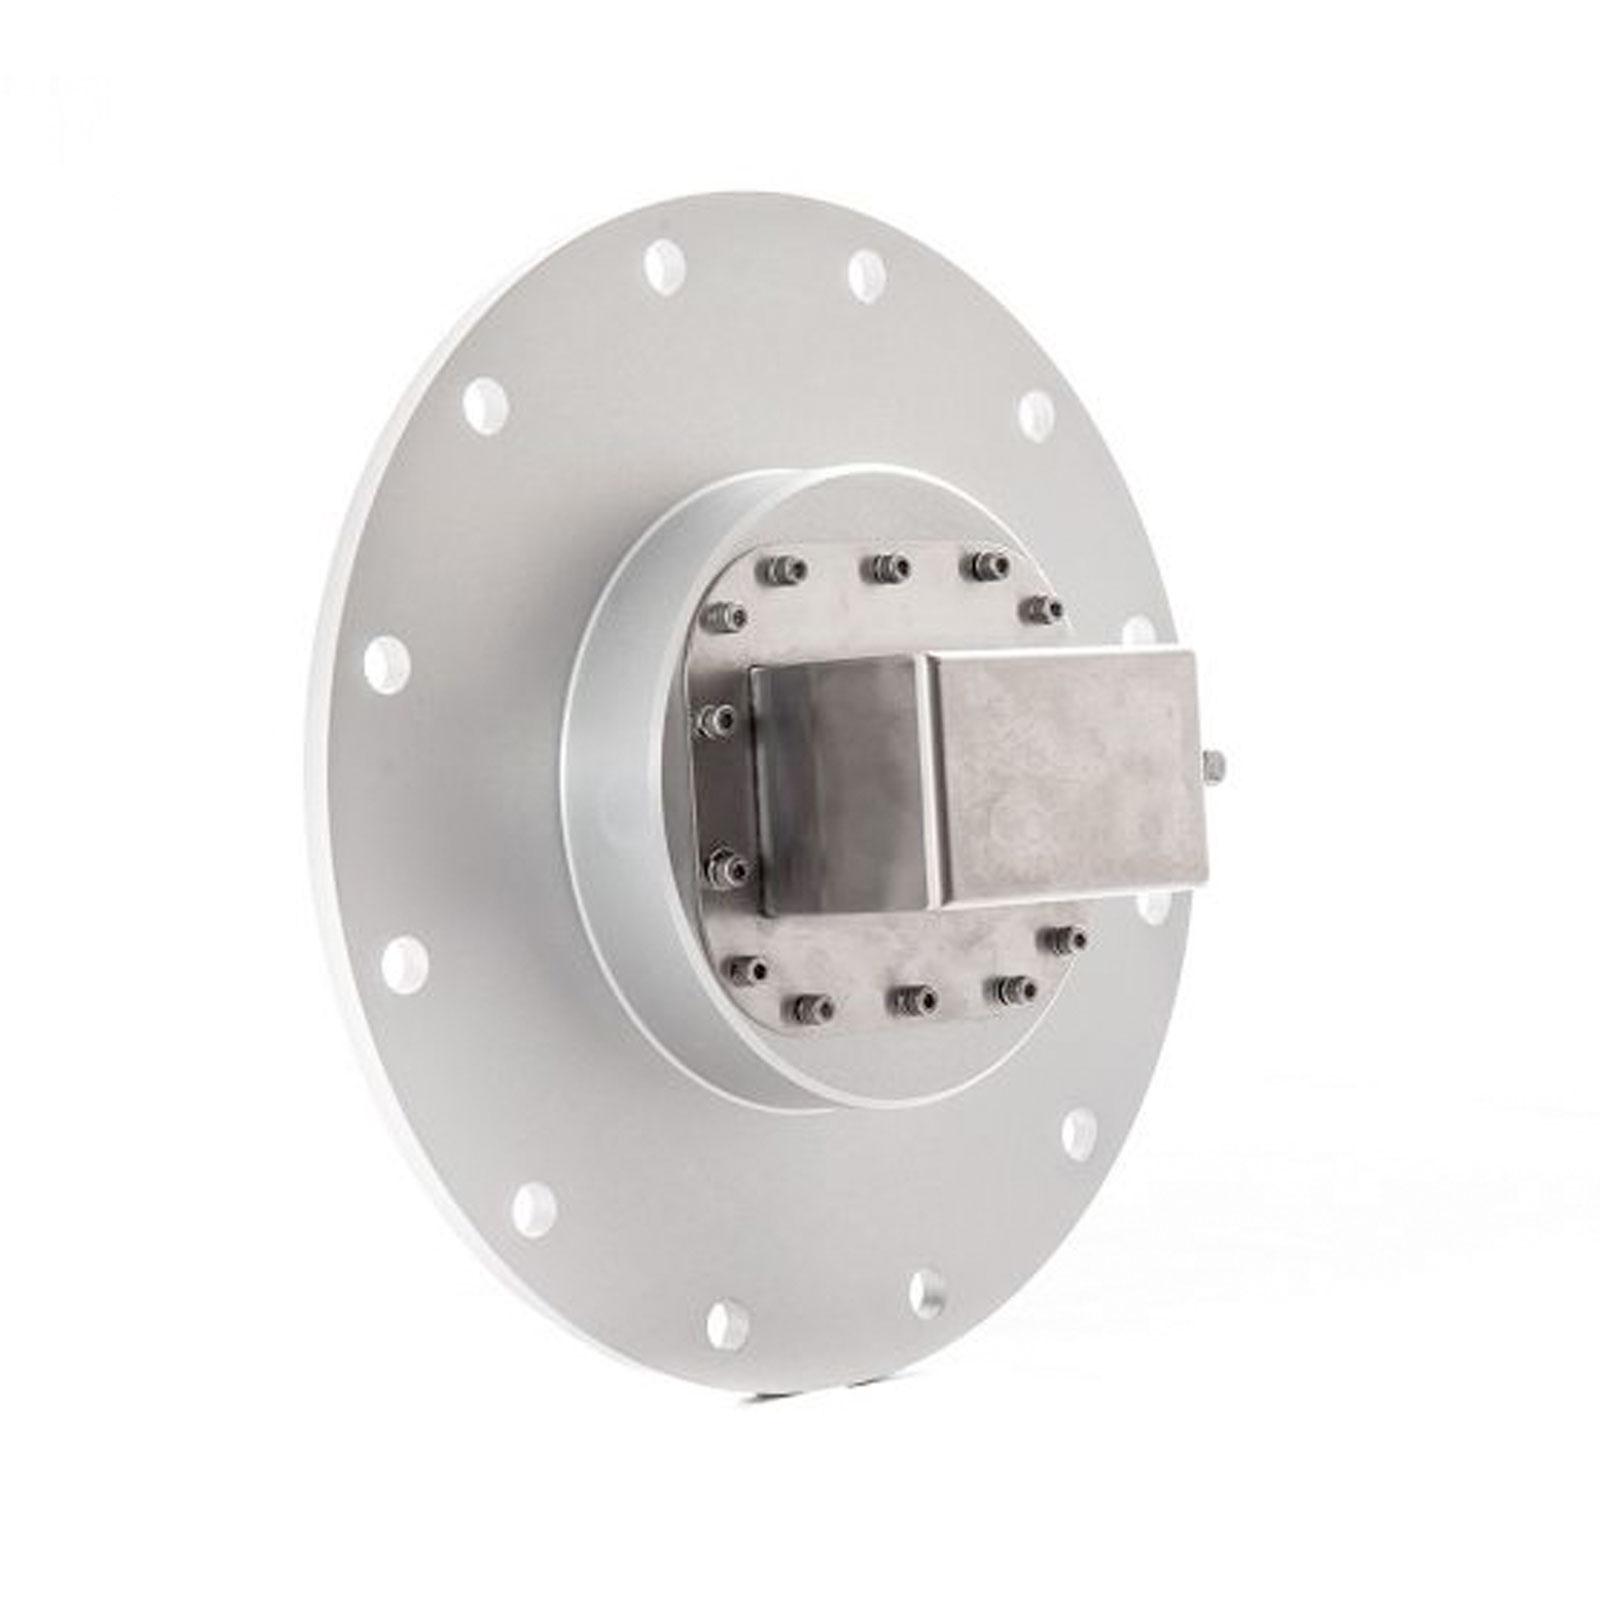 Antena espiral UHF para transformador Image